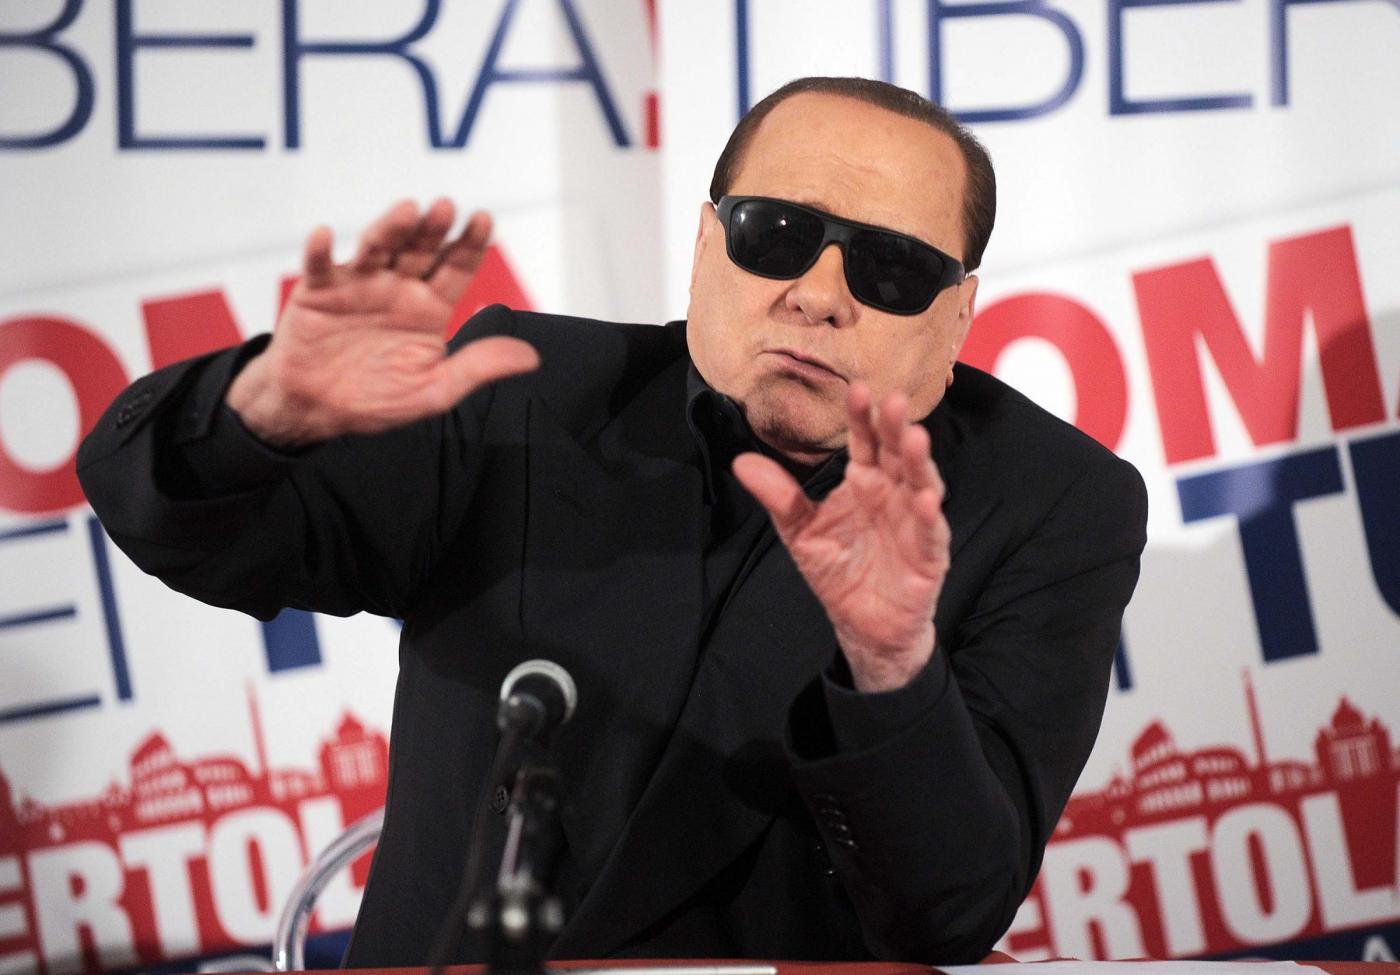 Panama Papers: 'Silvio Berlusconi è estraneo', parola di Ghedini